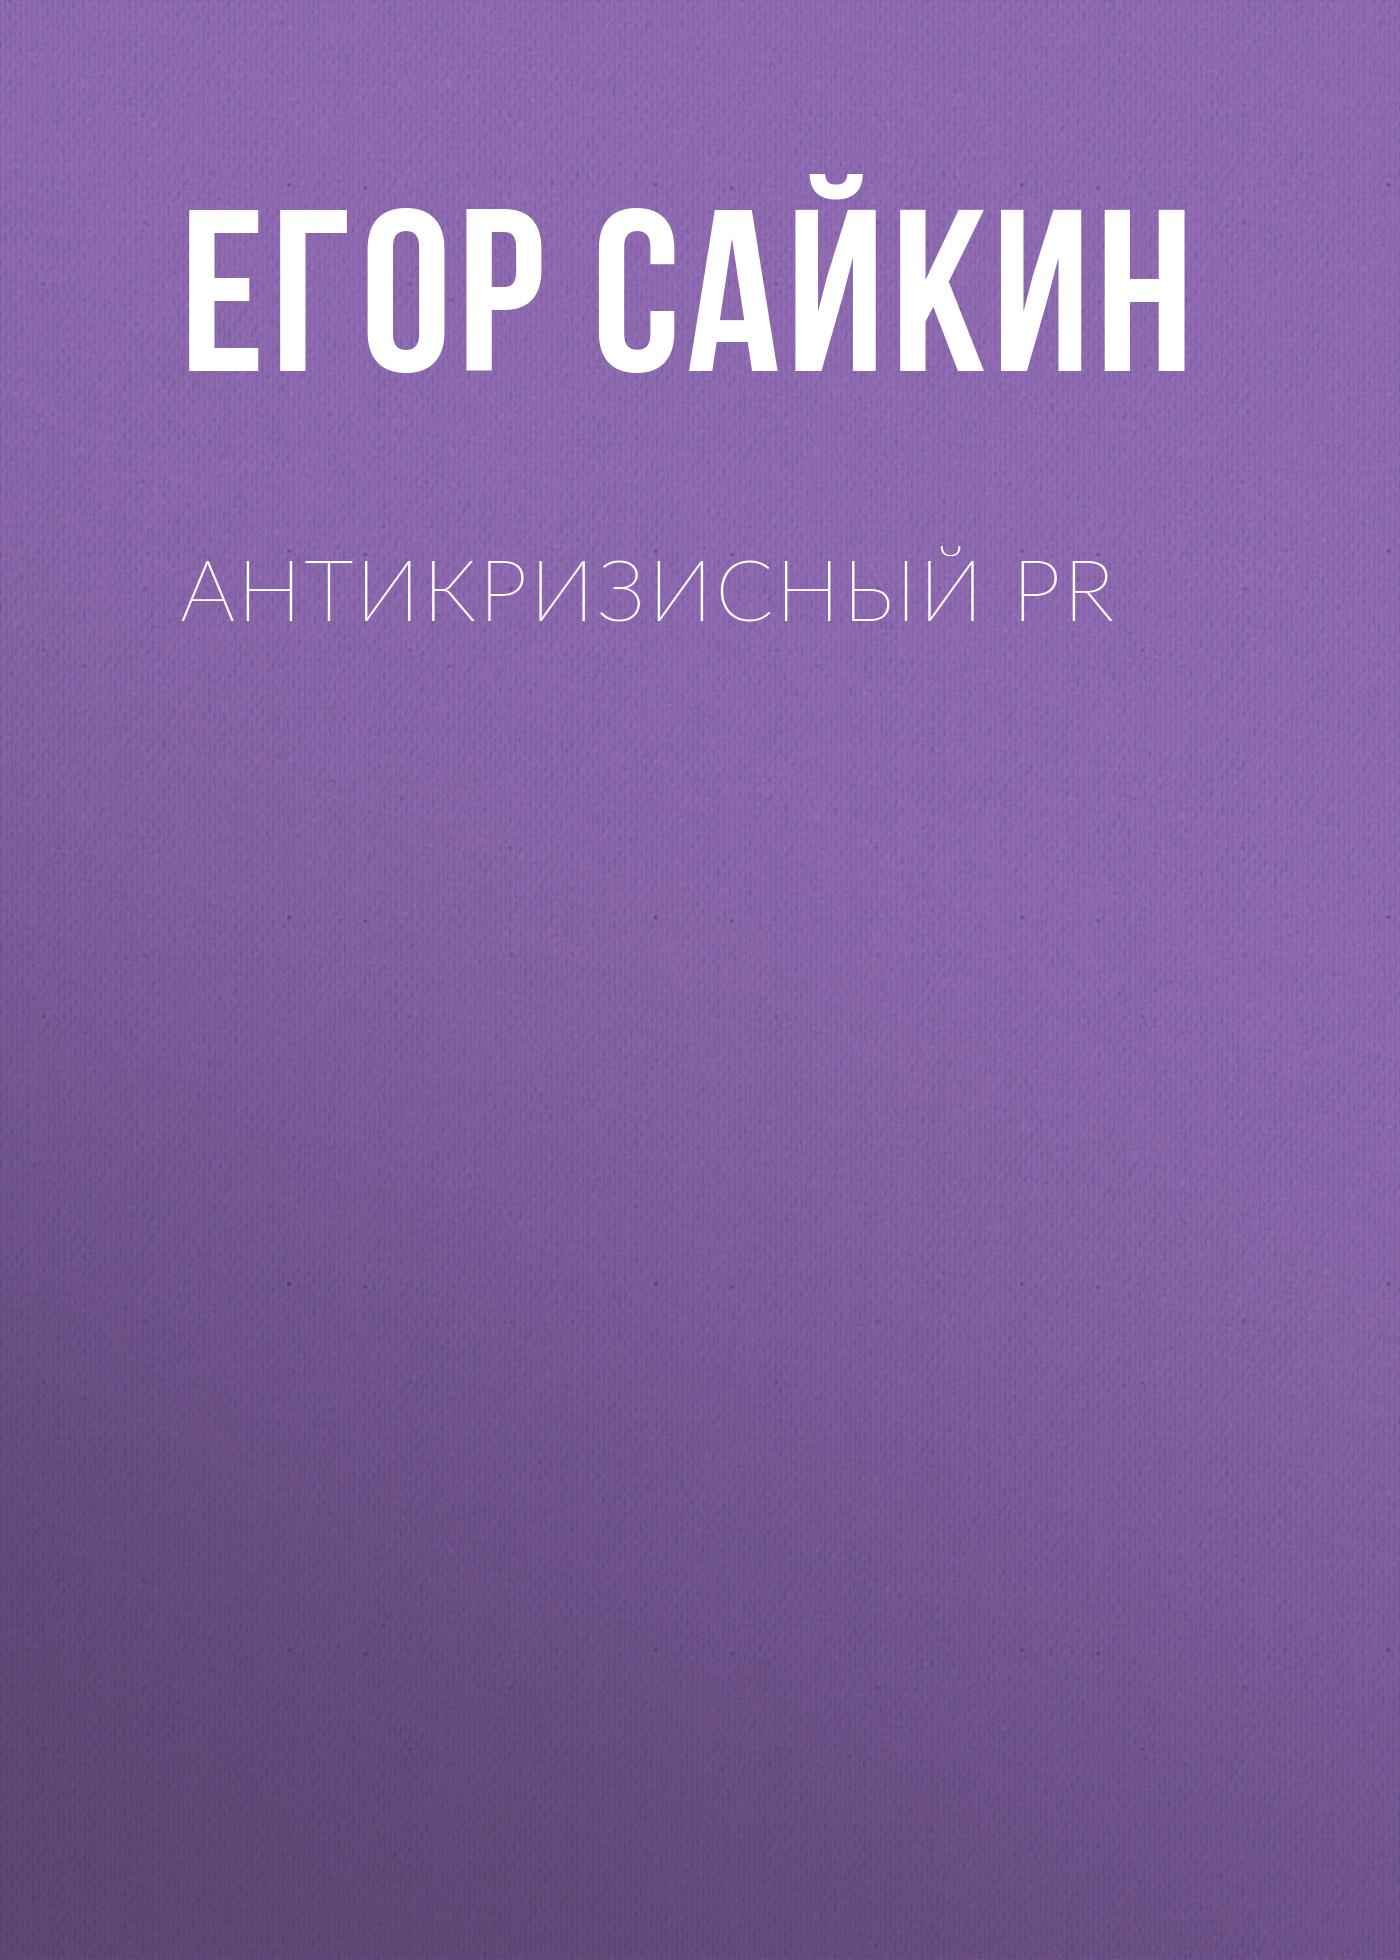 Егор Сайкин Антикризисный PR тарифный план